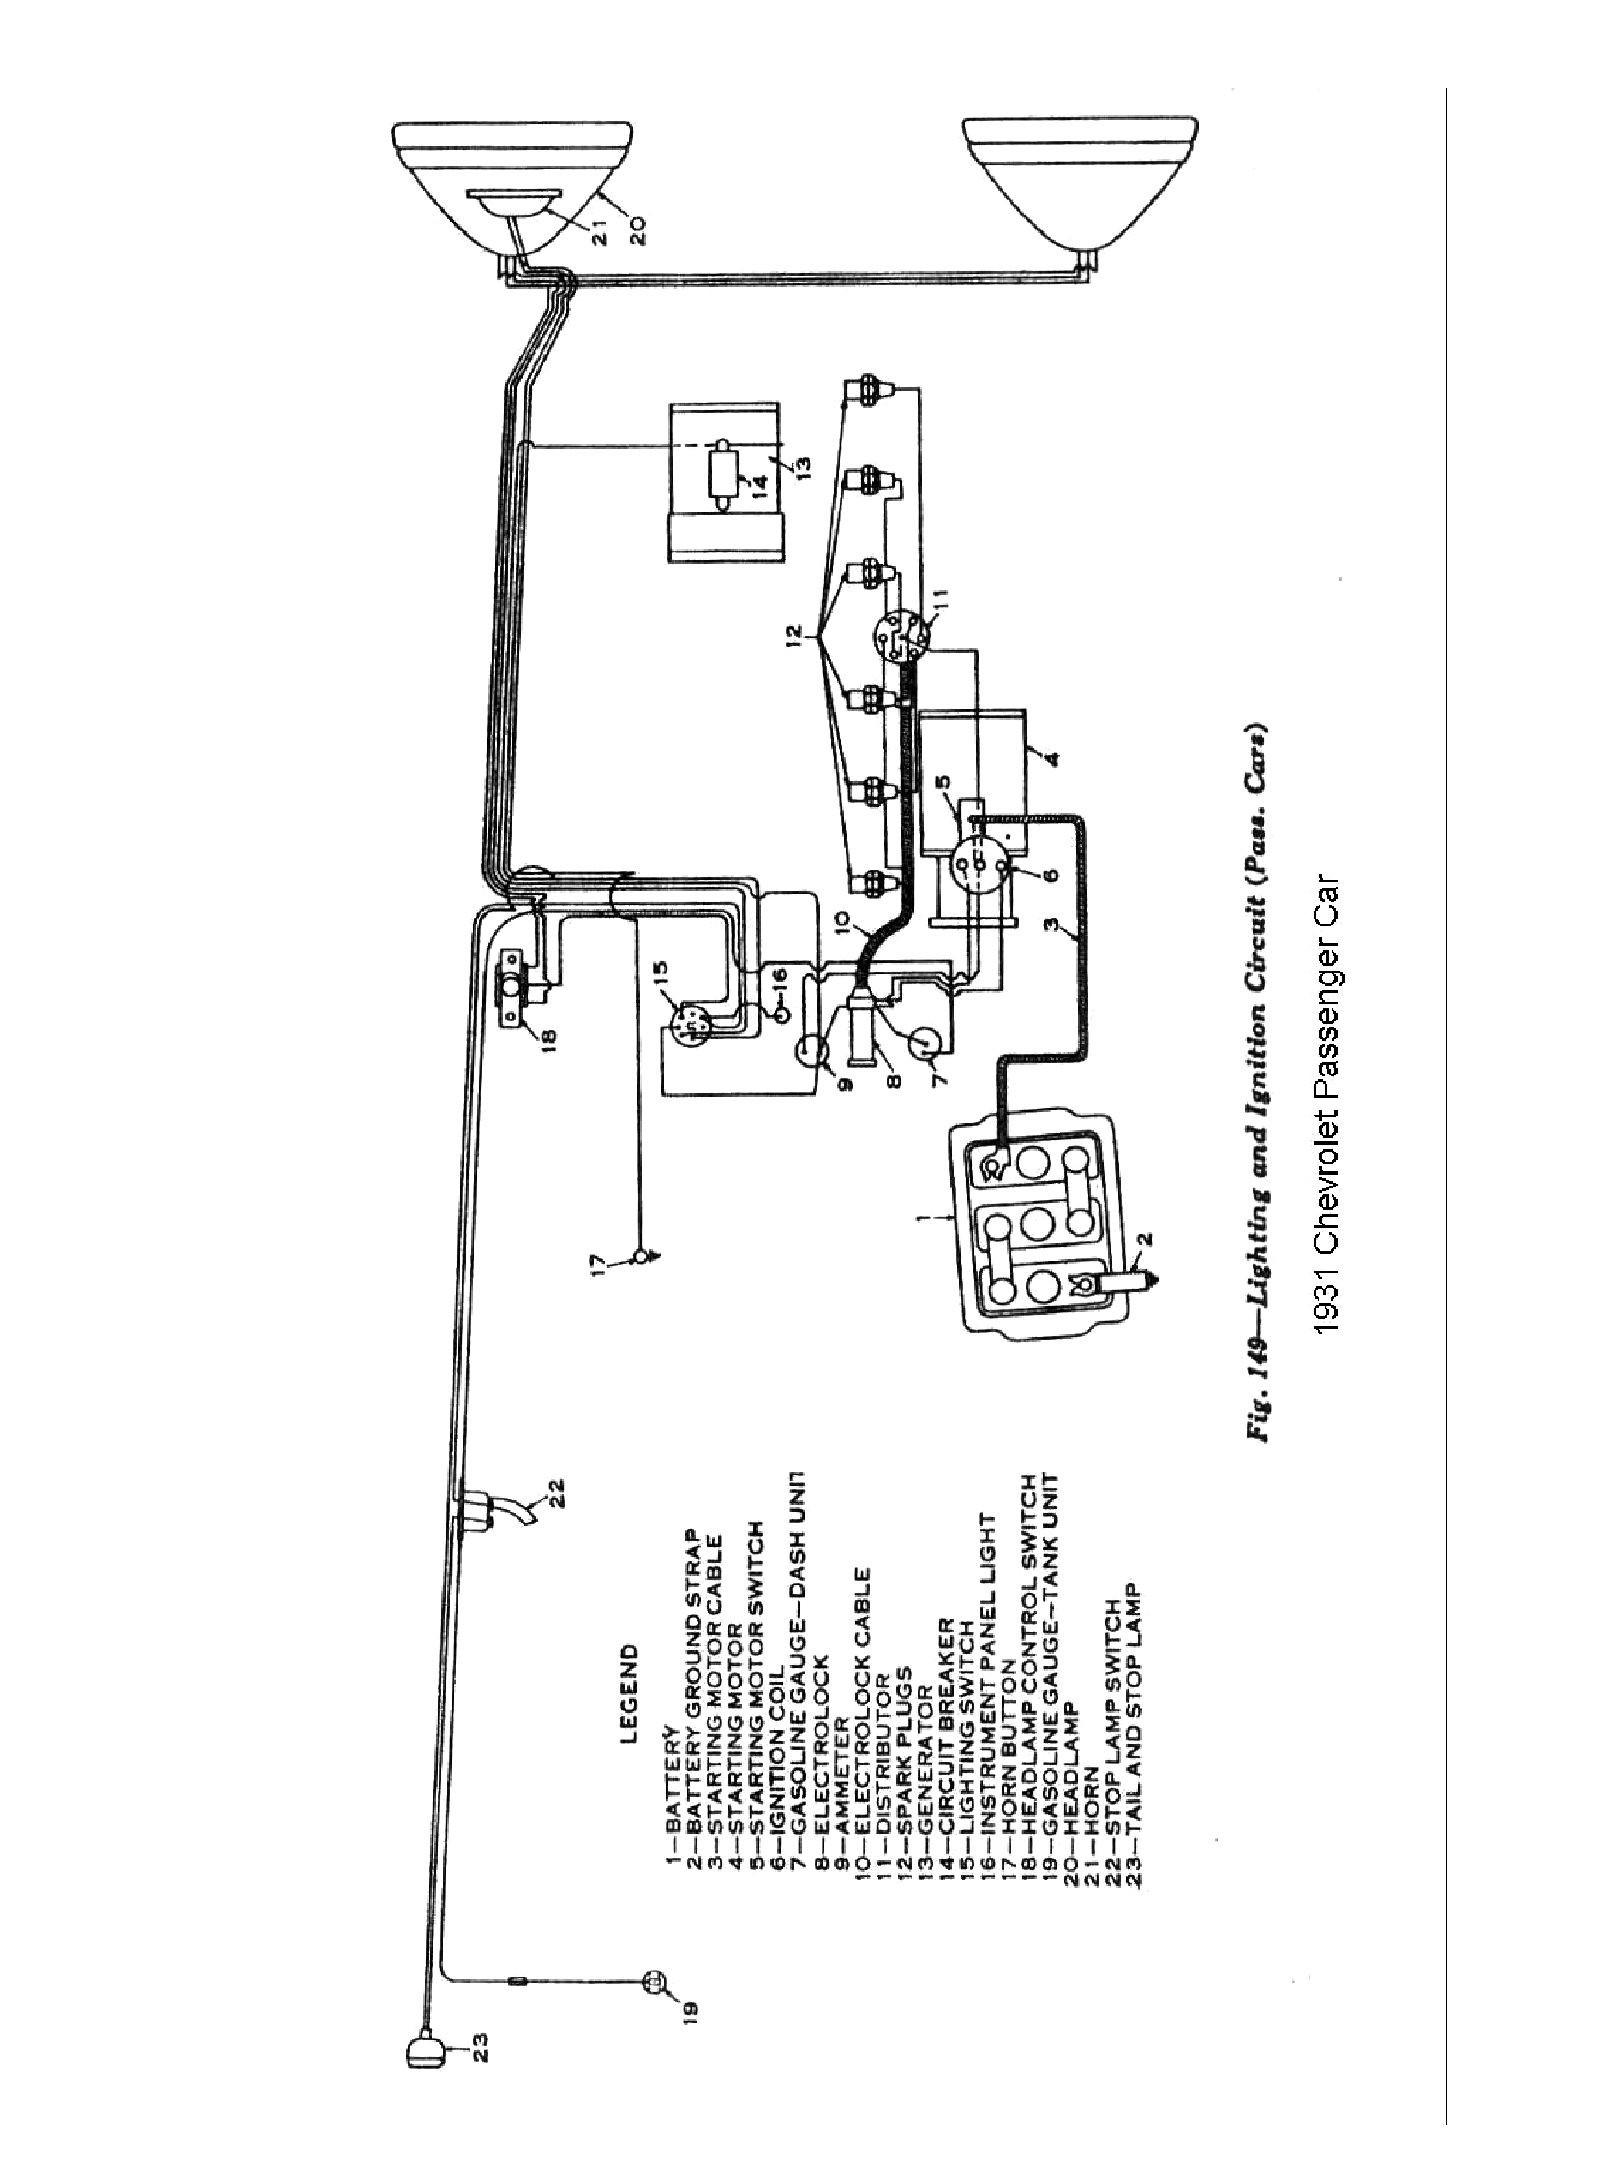 hight resolution of 1931 1931 wiring diagrams 1931 lighting ignition unique chevy ignition coil wiring diagram diagram